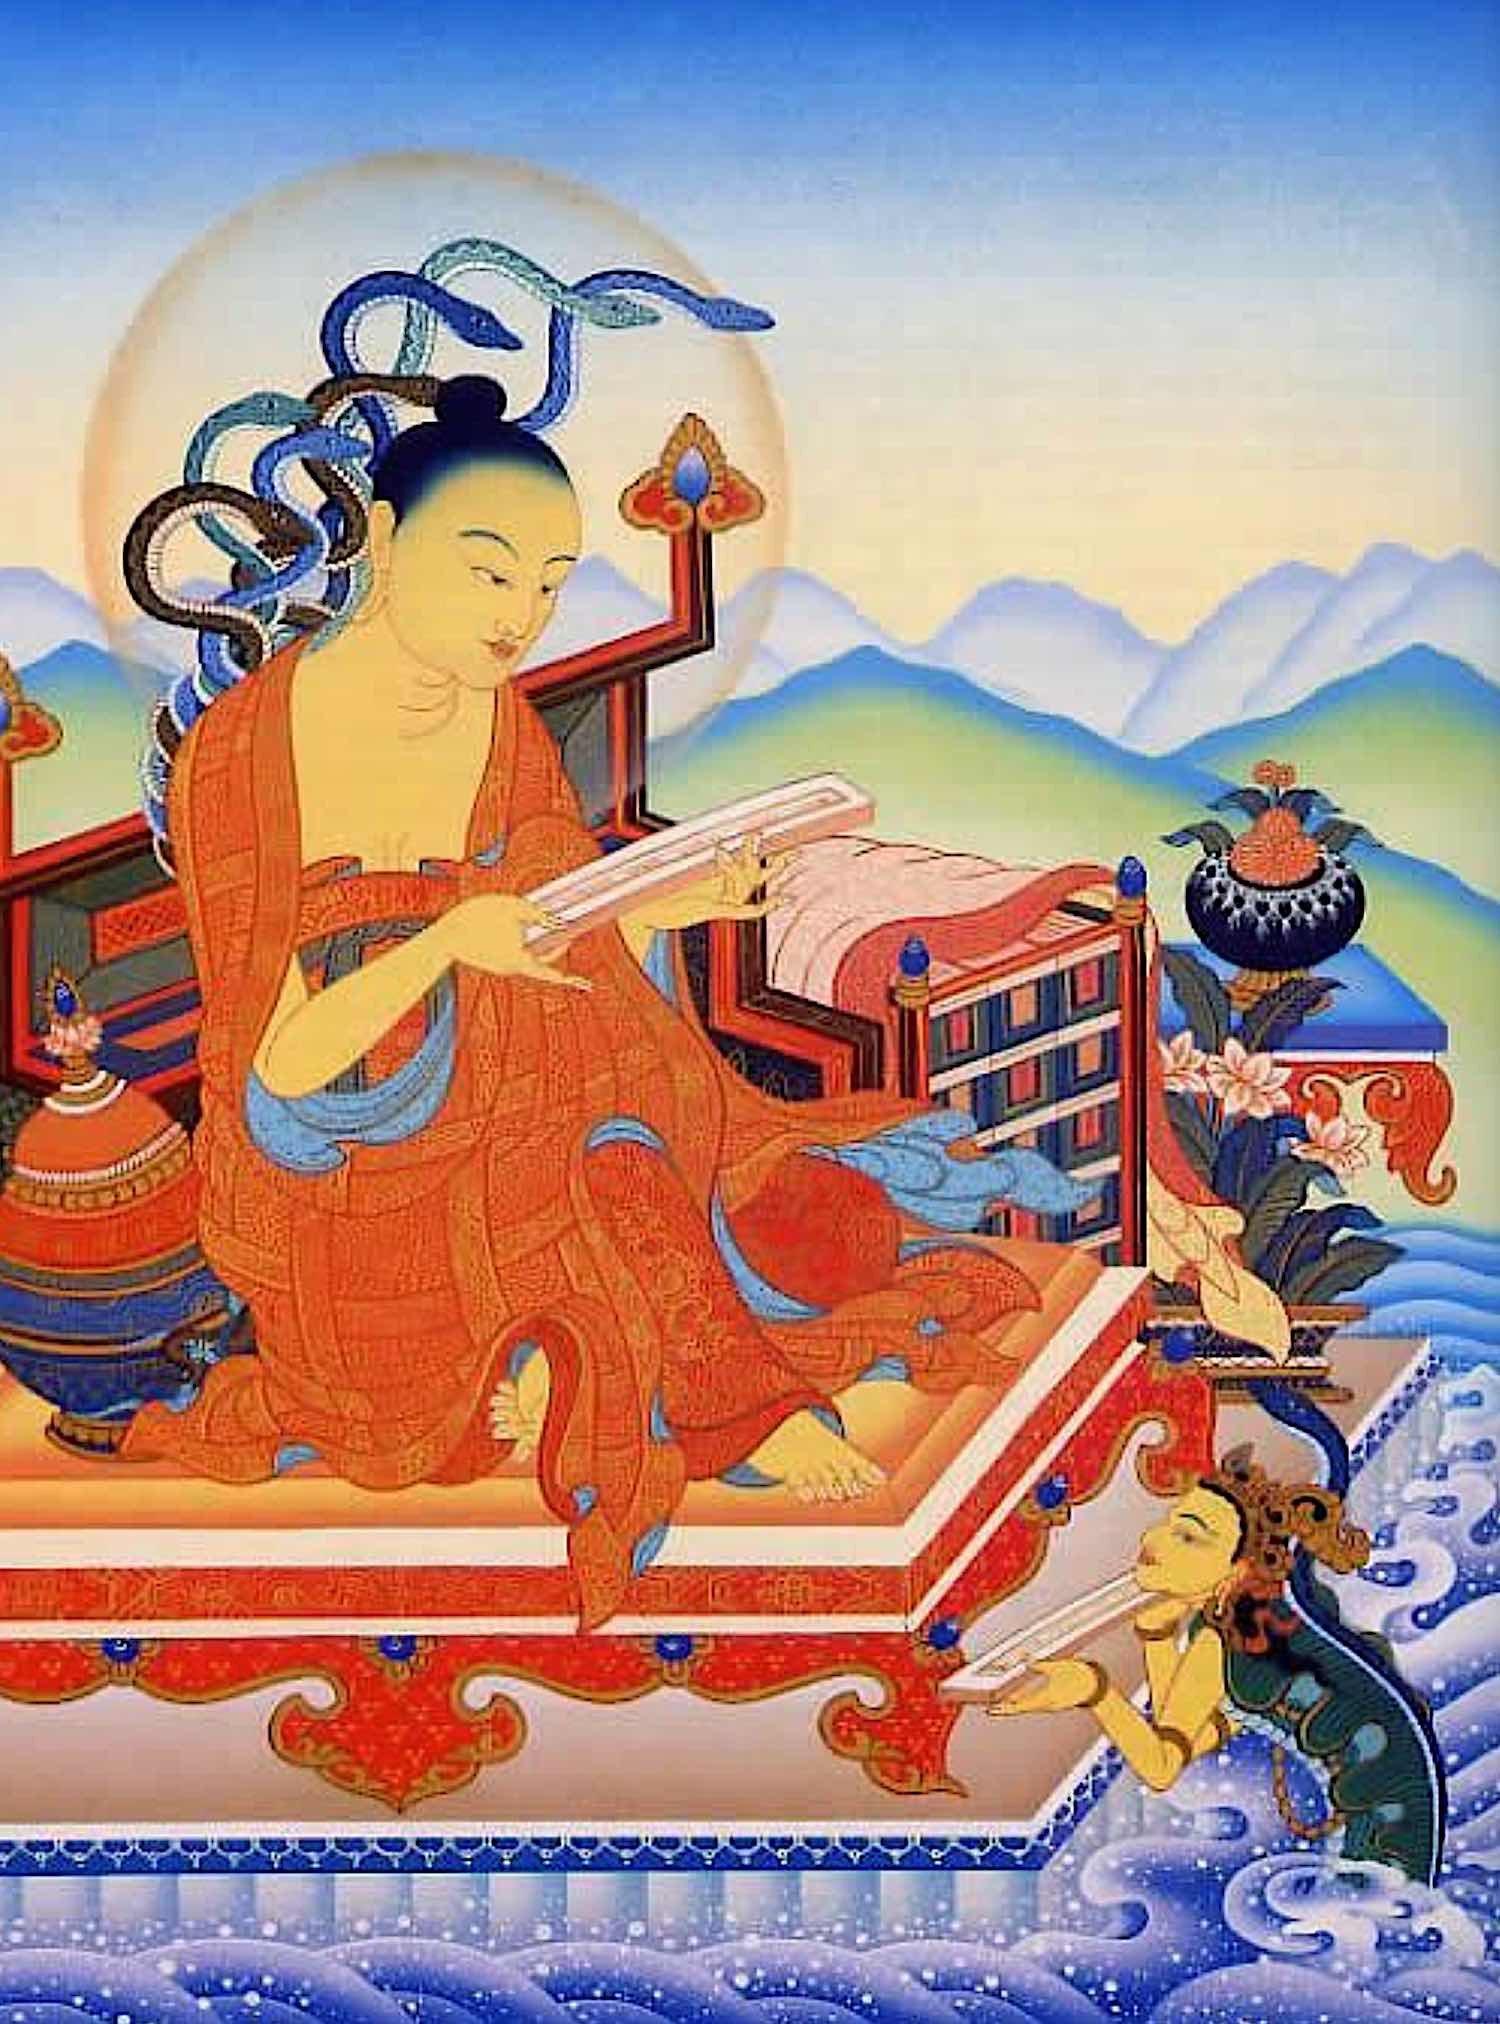 Buddha Weekly Nagarjuna receiving Mahayana text from Naga King Varuna Buddhism 2